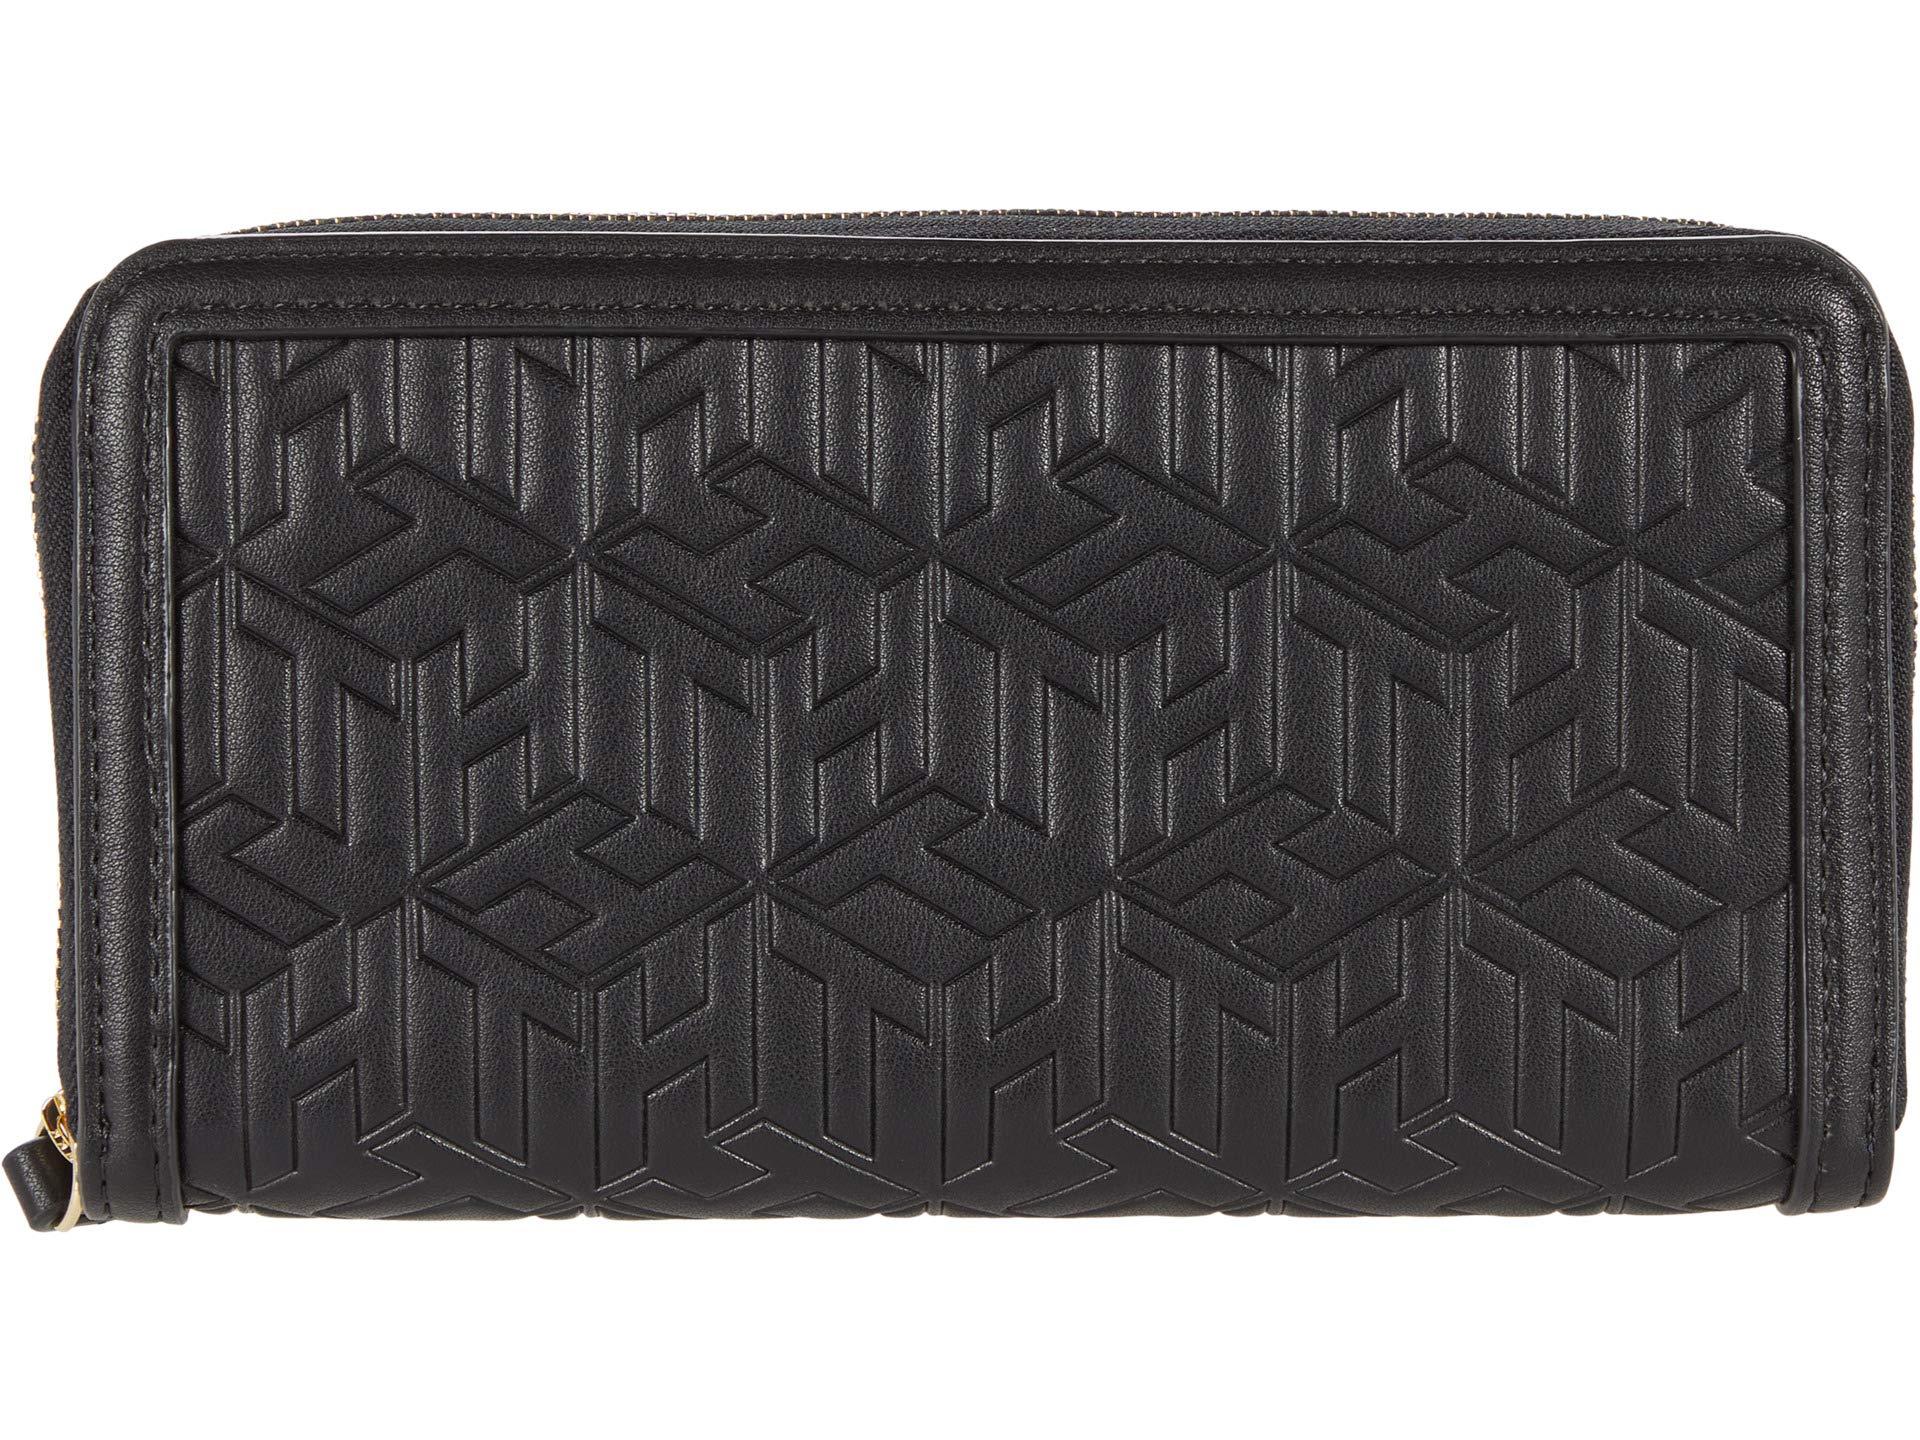 Tommy Hilfiger Tommy Hilfiger April Large Zip Wallet - TH Cube Embossed PVC